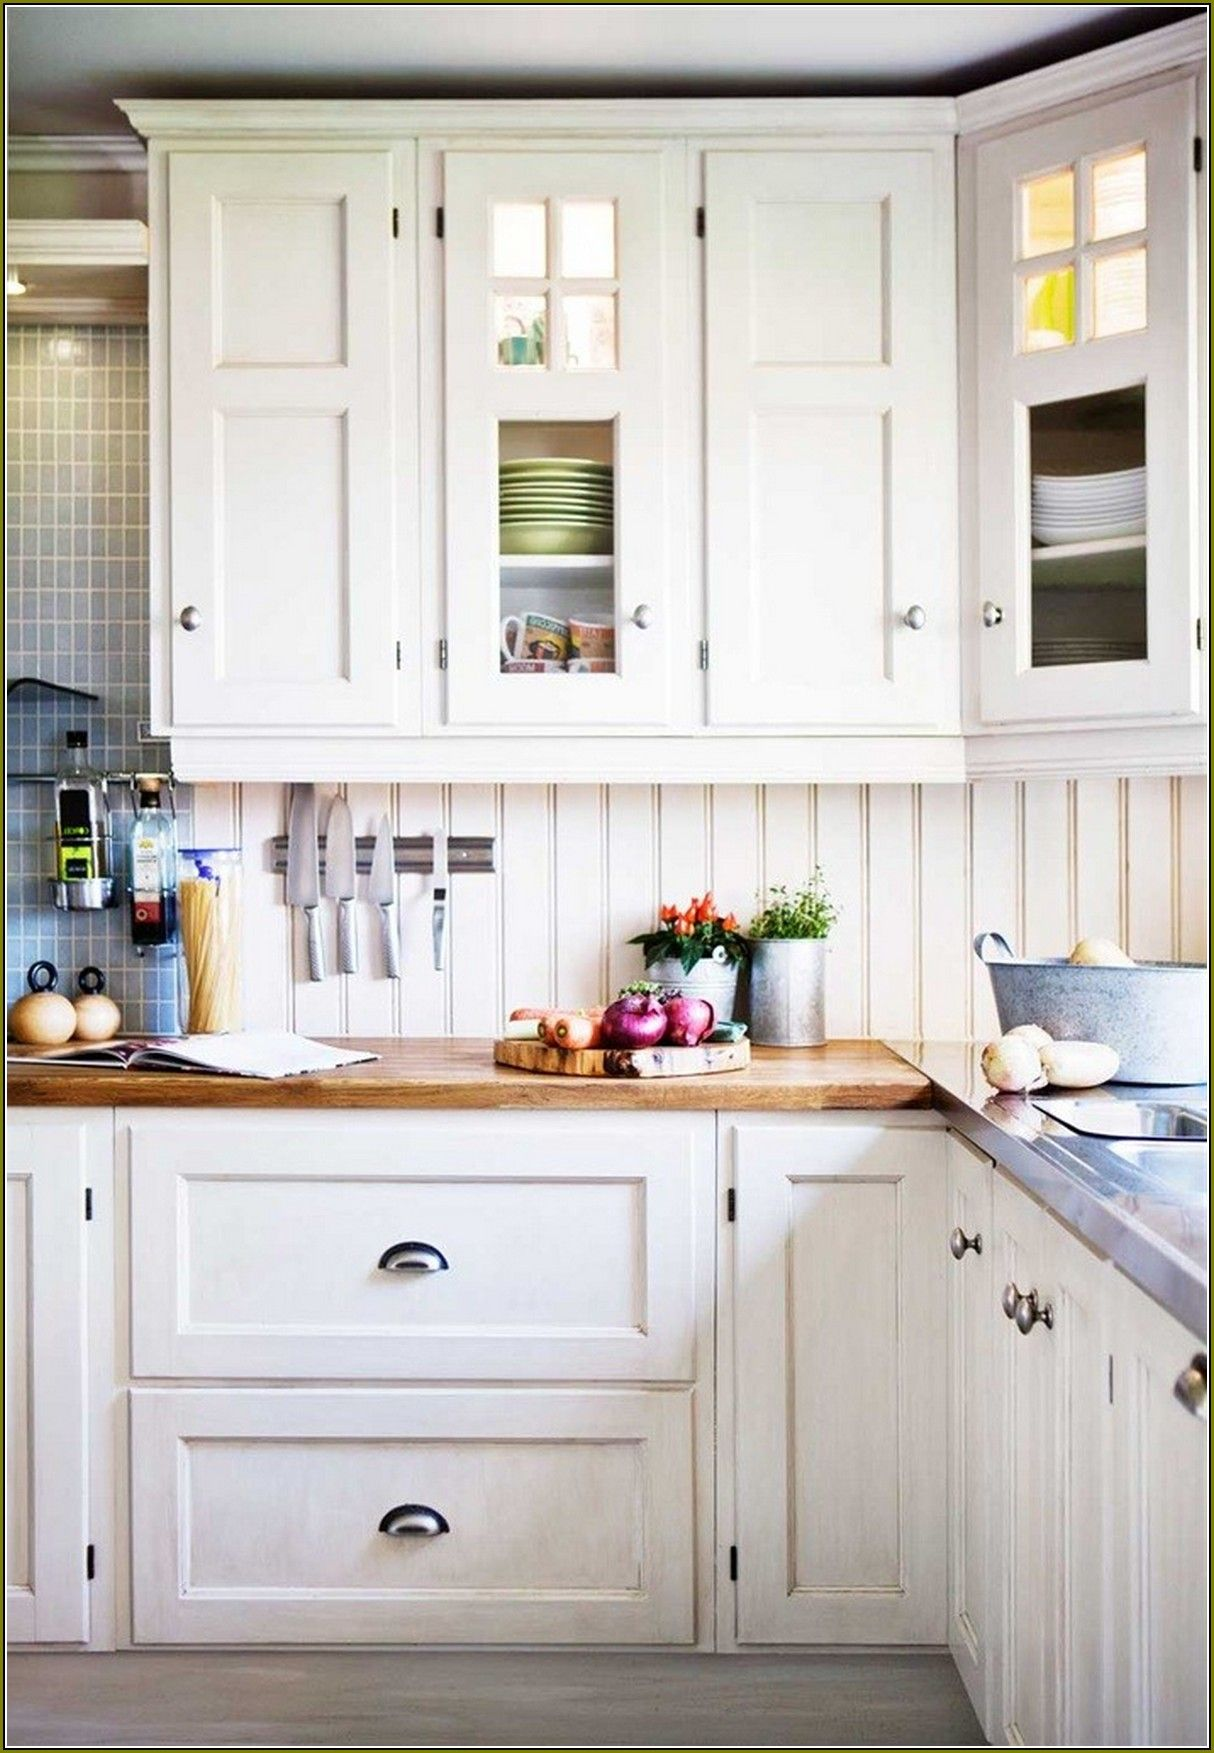 image of kitchen cabinets hardware design rustic kitchen cabinets best kitchen cabinets on farmhouse kitchen hardware id=60595